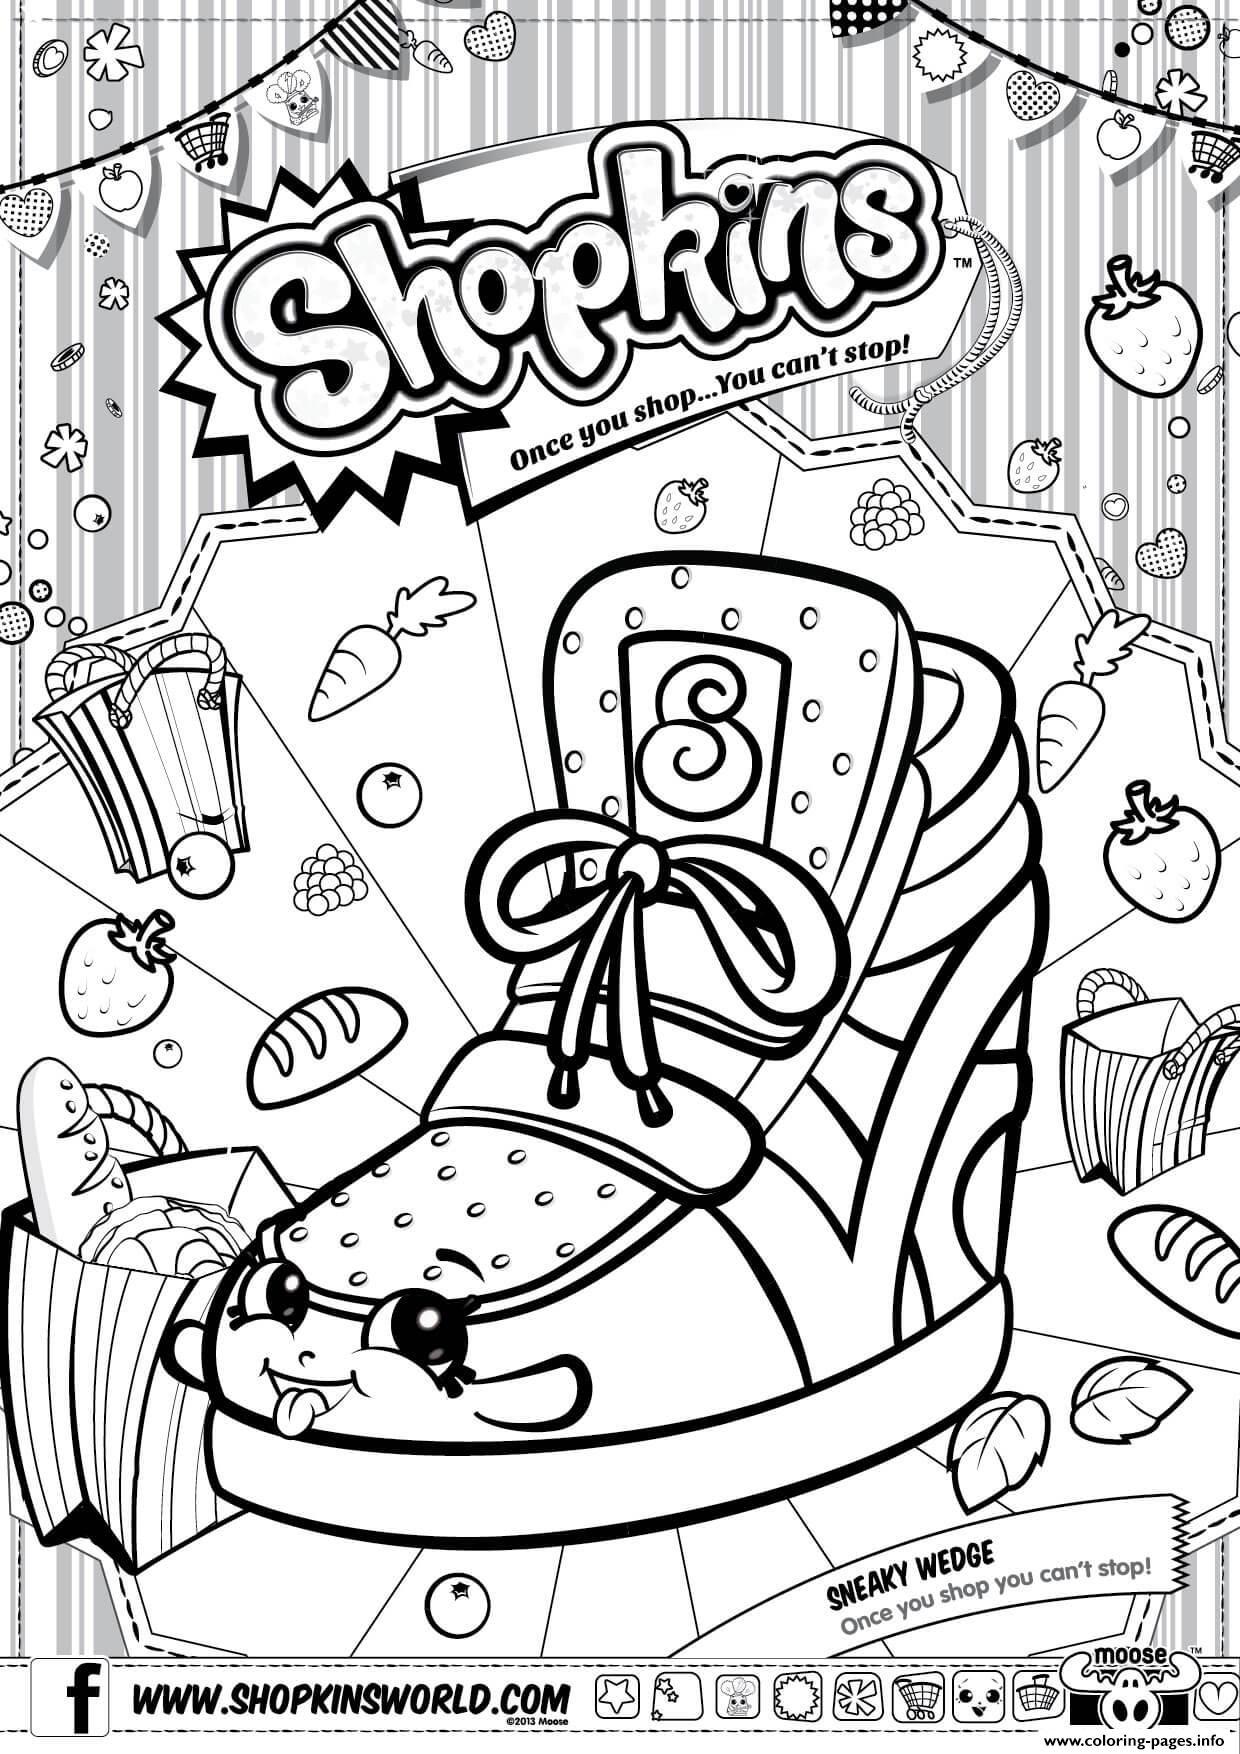 Shopkins Season 3 Coloring Pages Printable